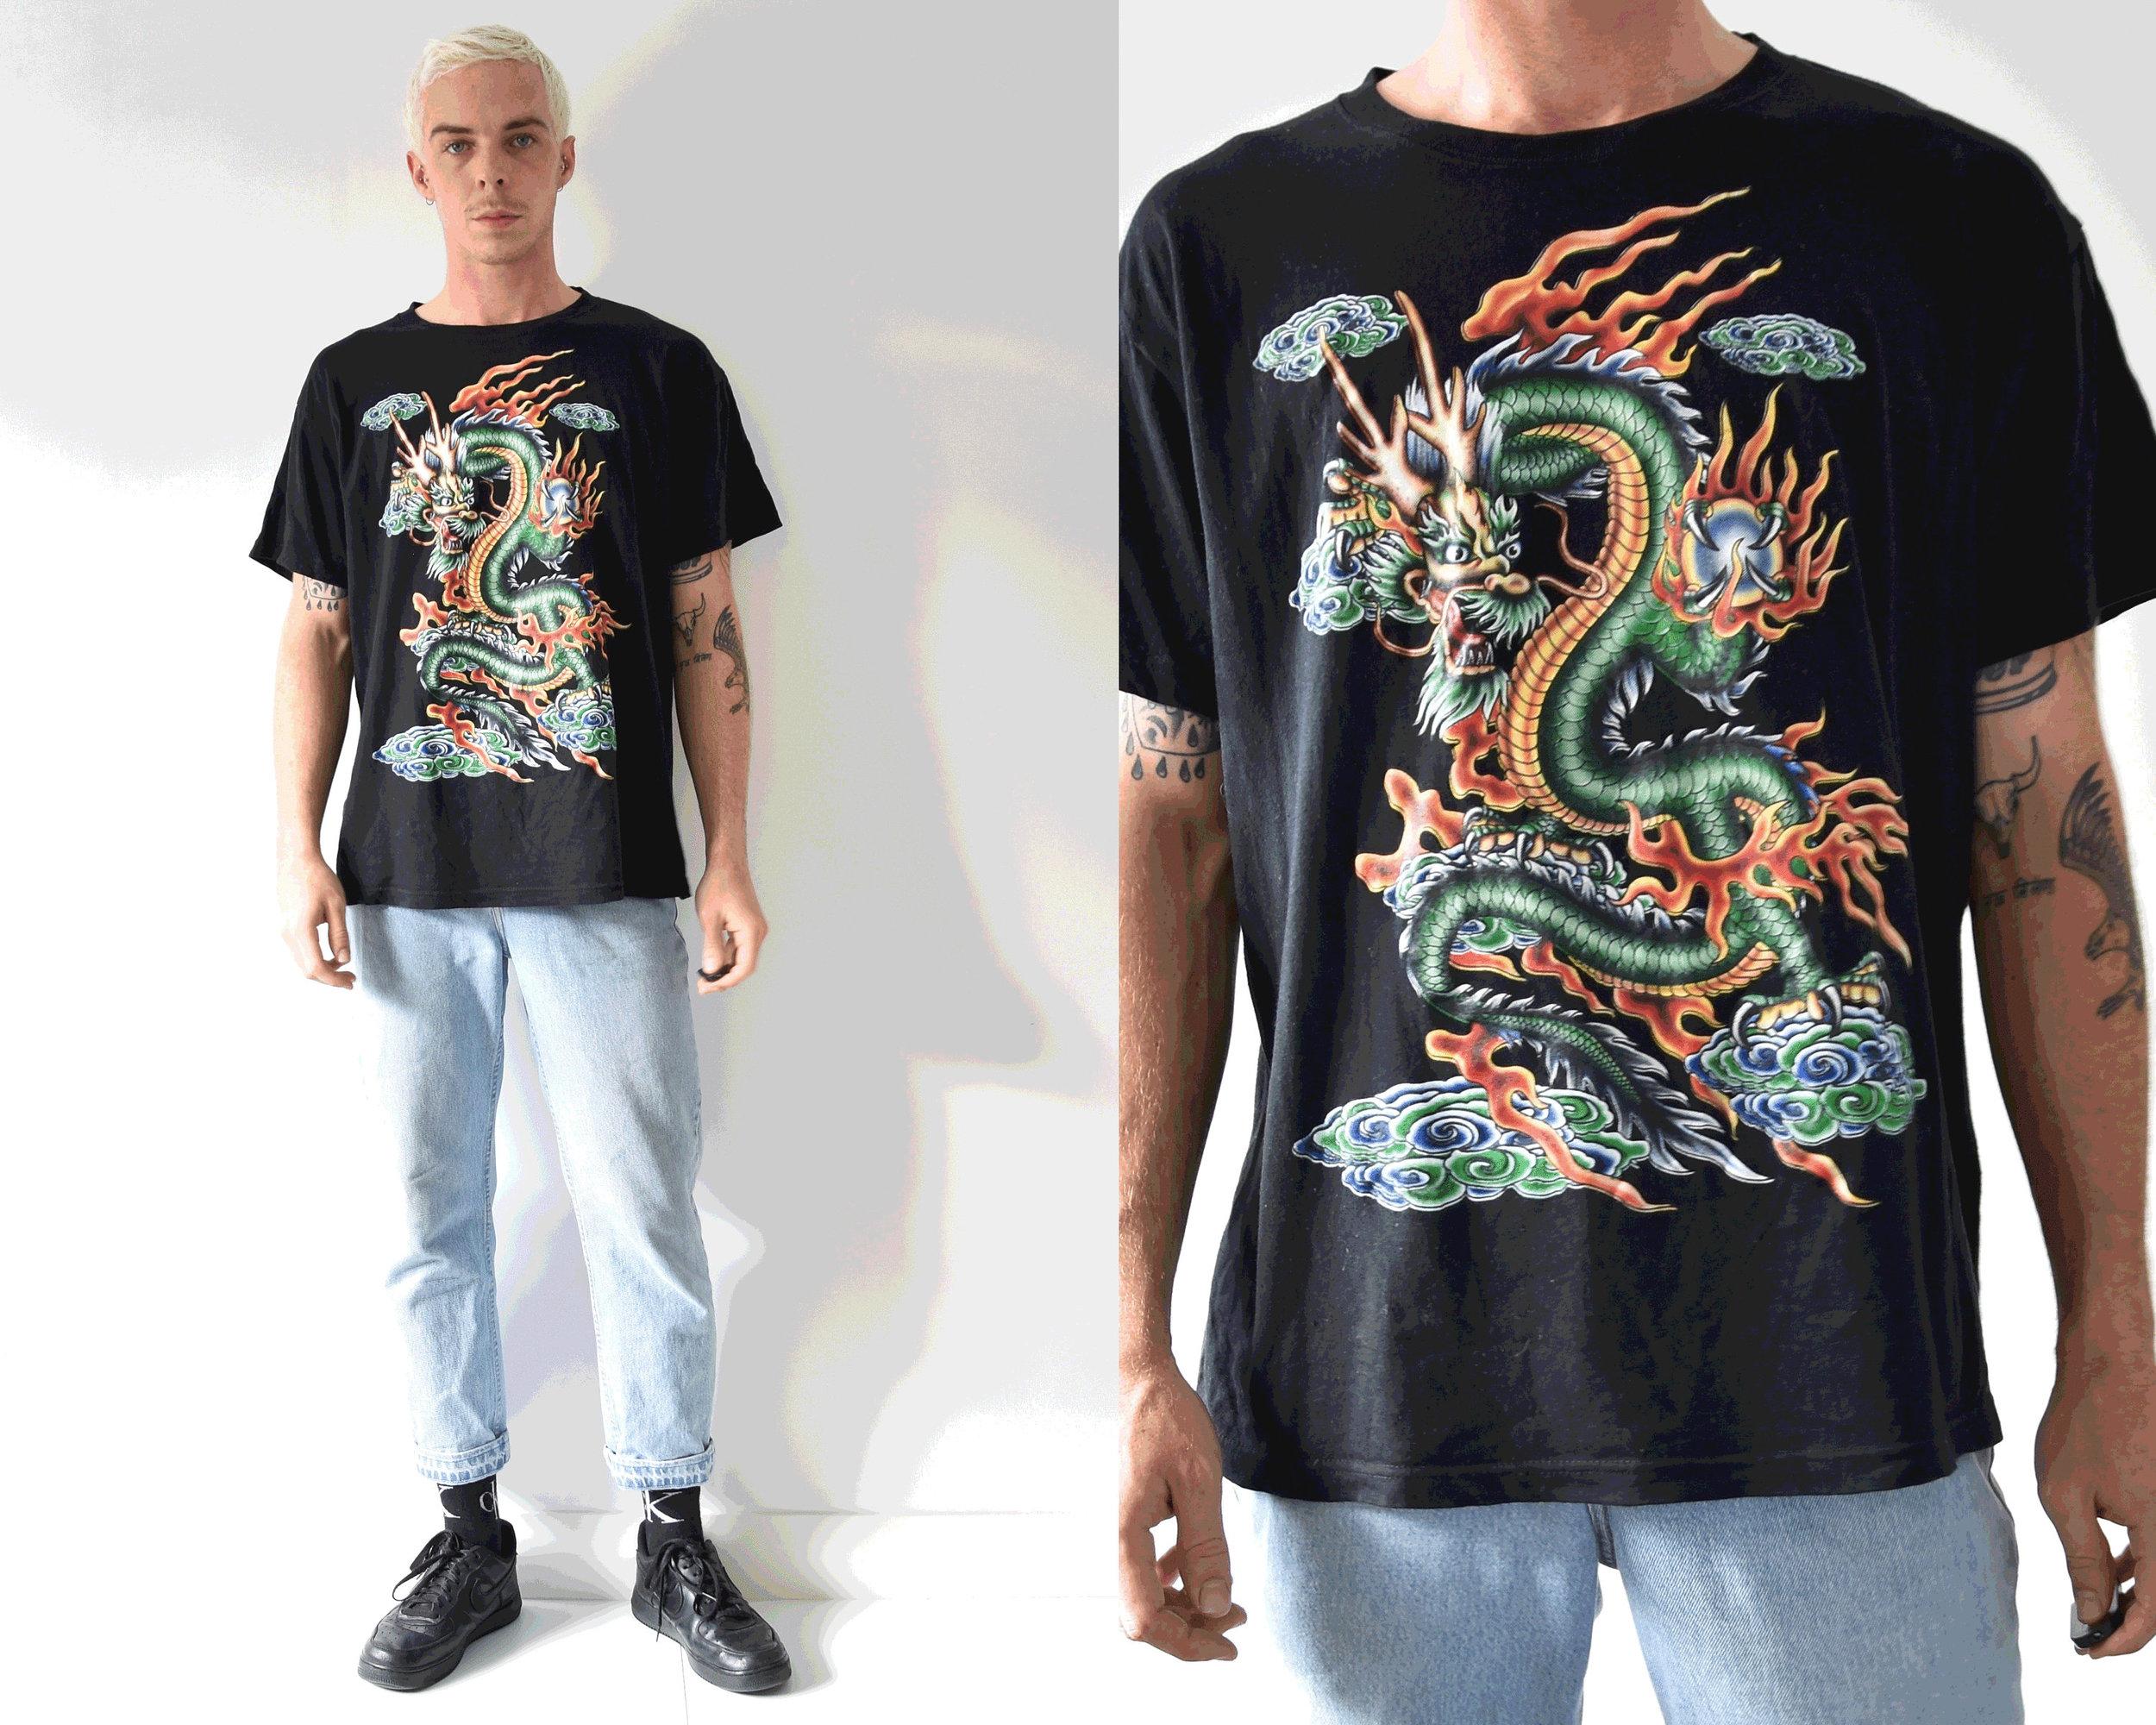 Oriental Blazing Dragon Print Tshirt from Chene Ryan Apparel